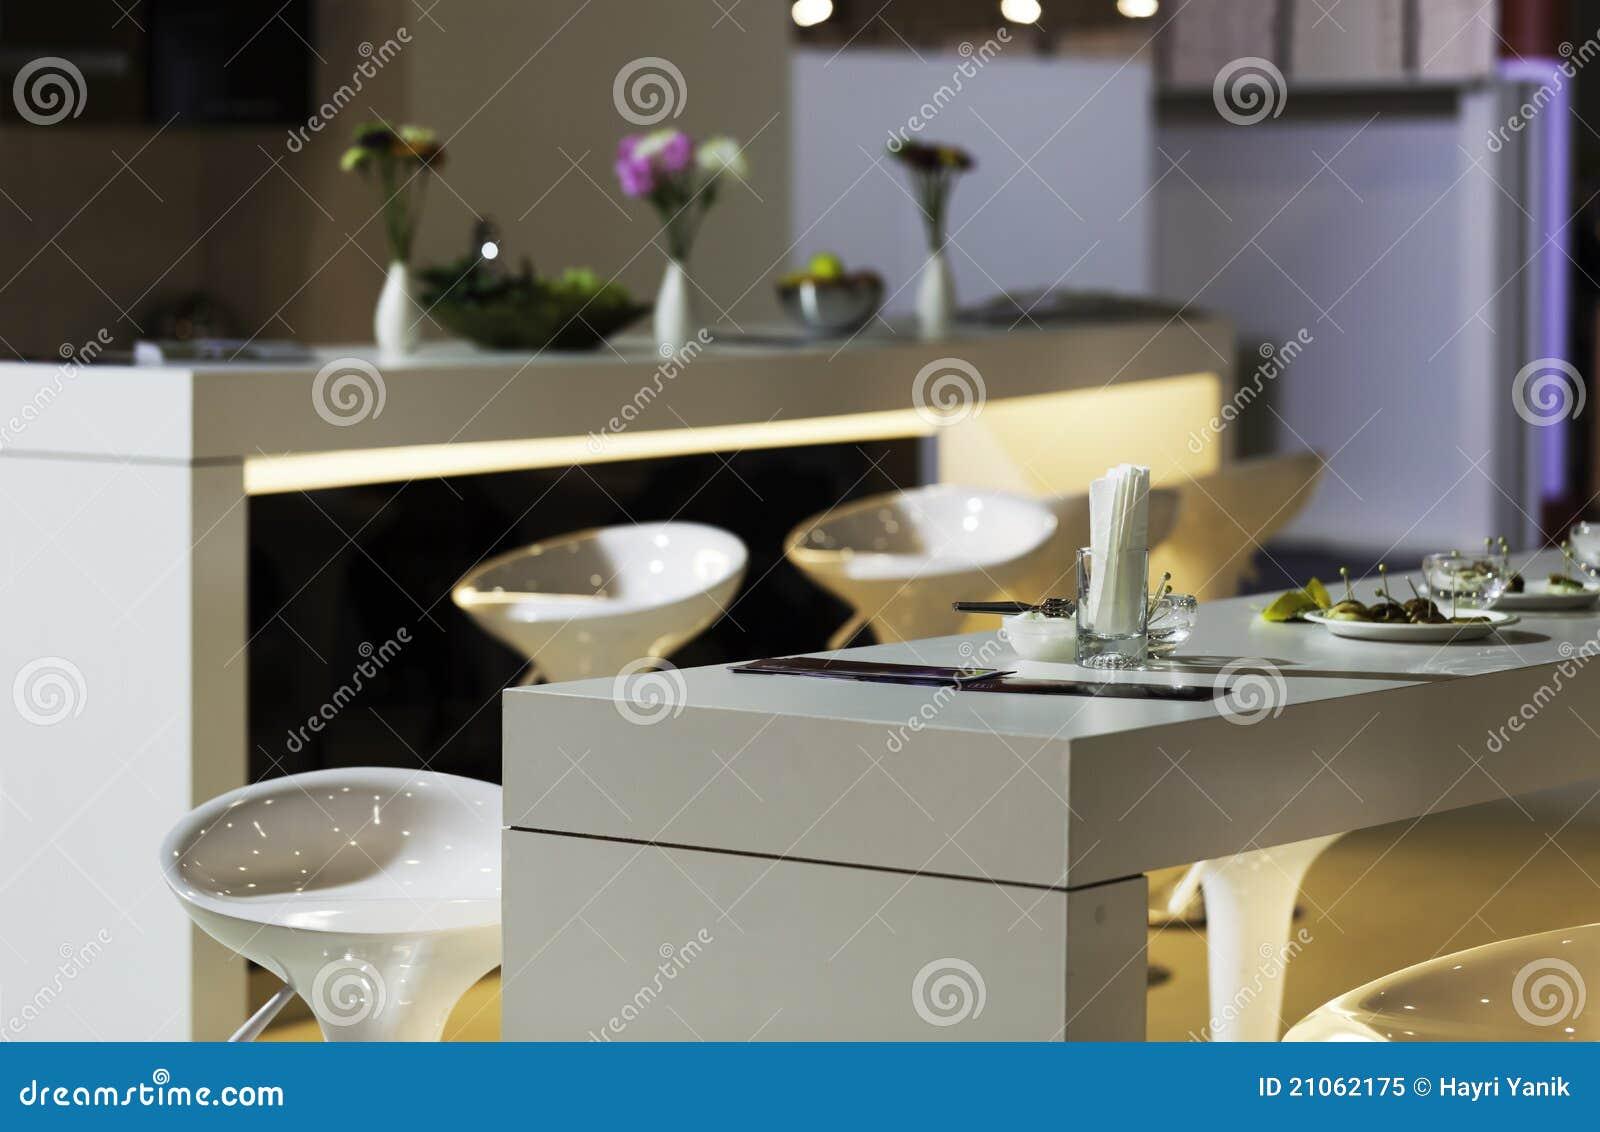 Modern bar stools in kitchen royalty free stock photo for Designer bar stools kitchen